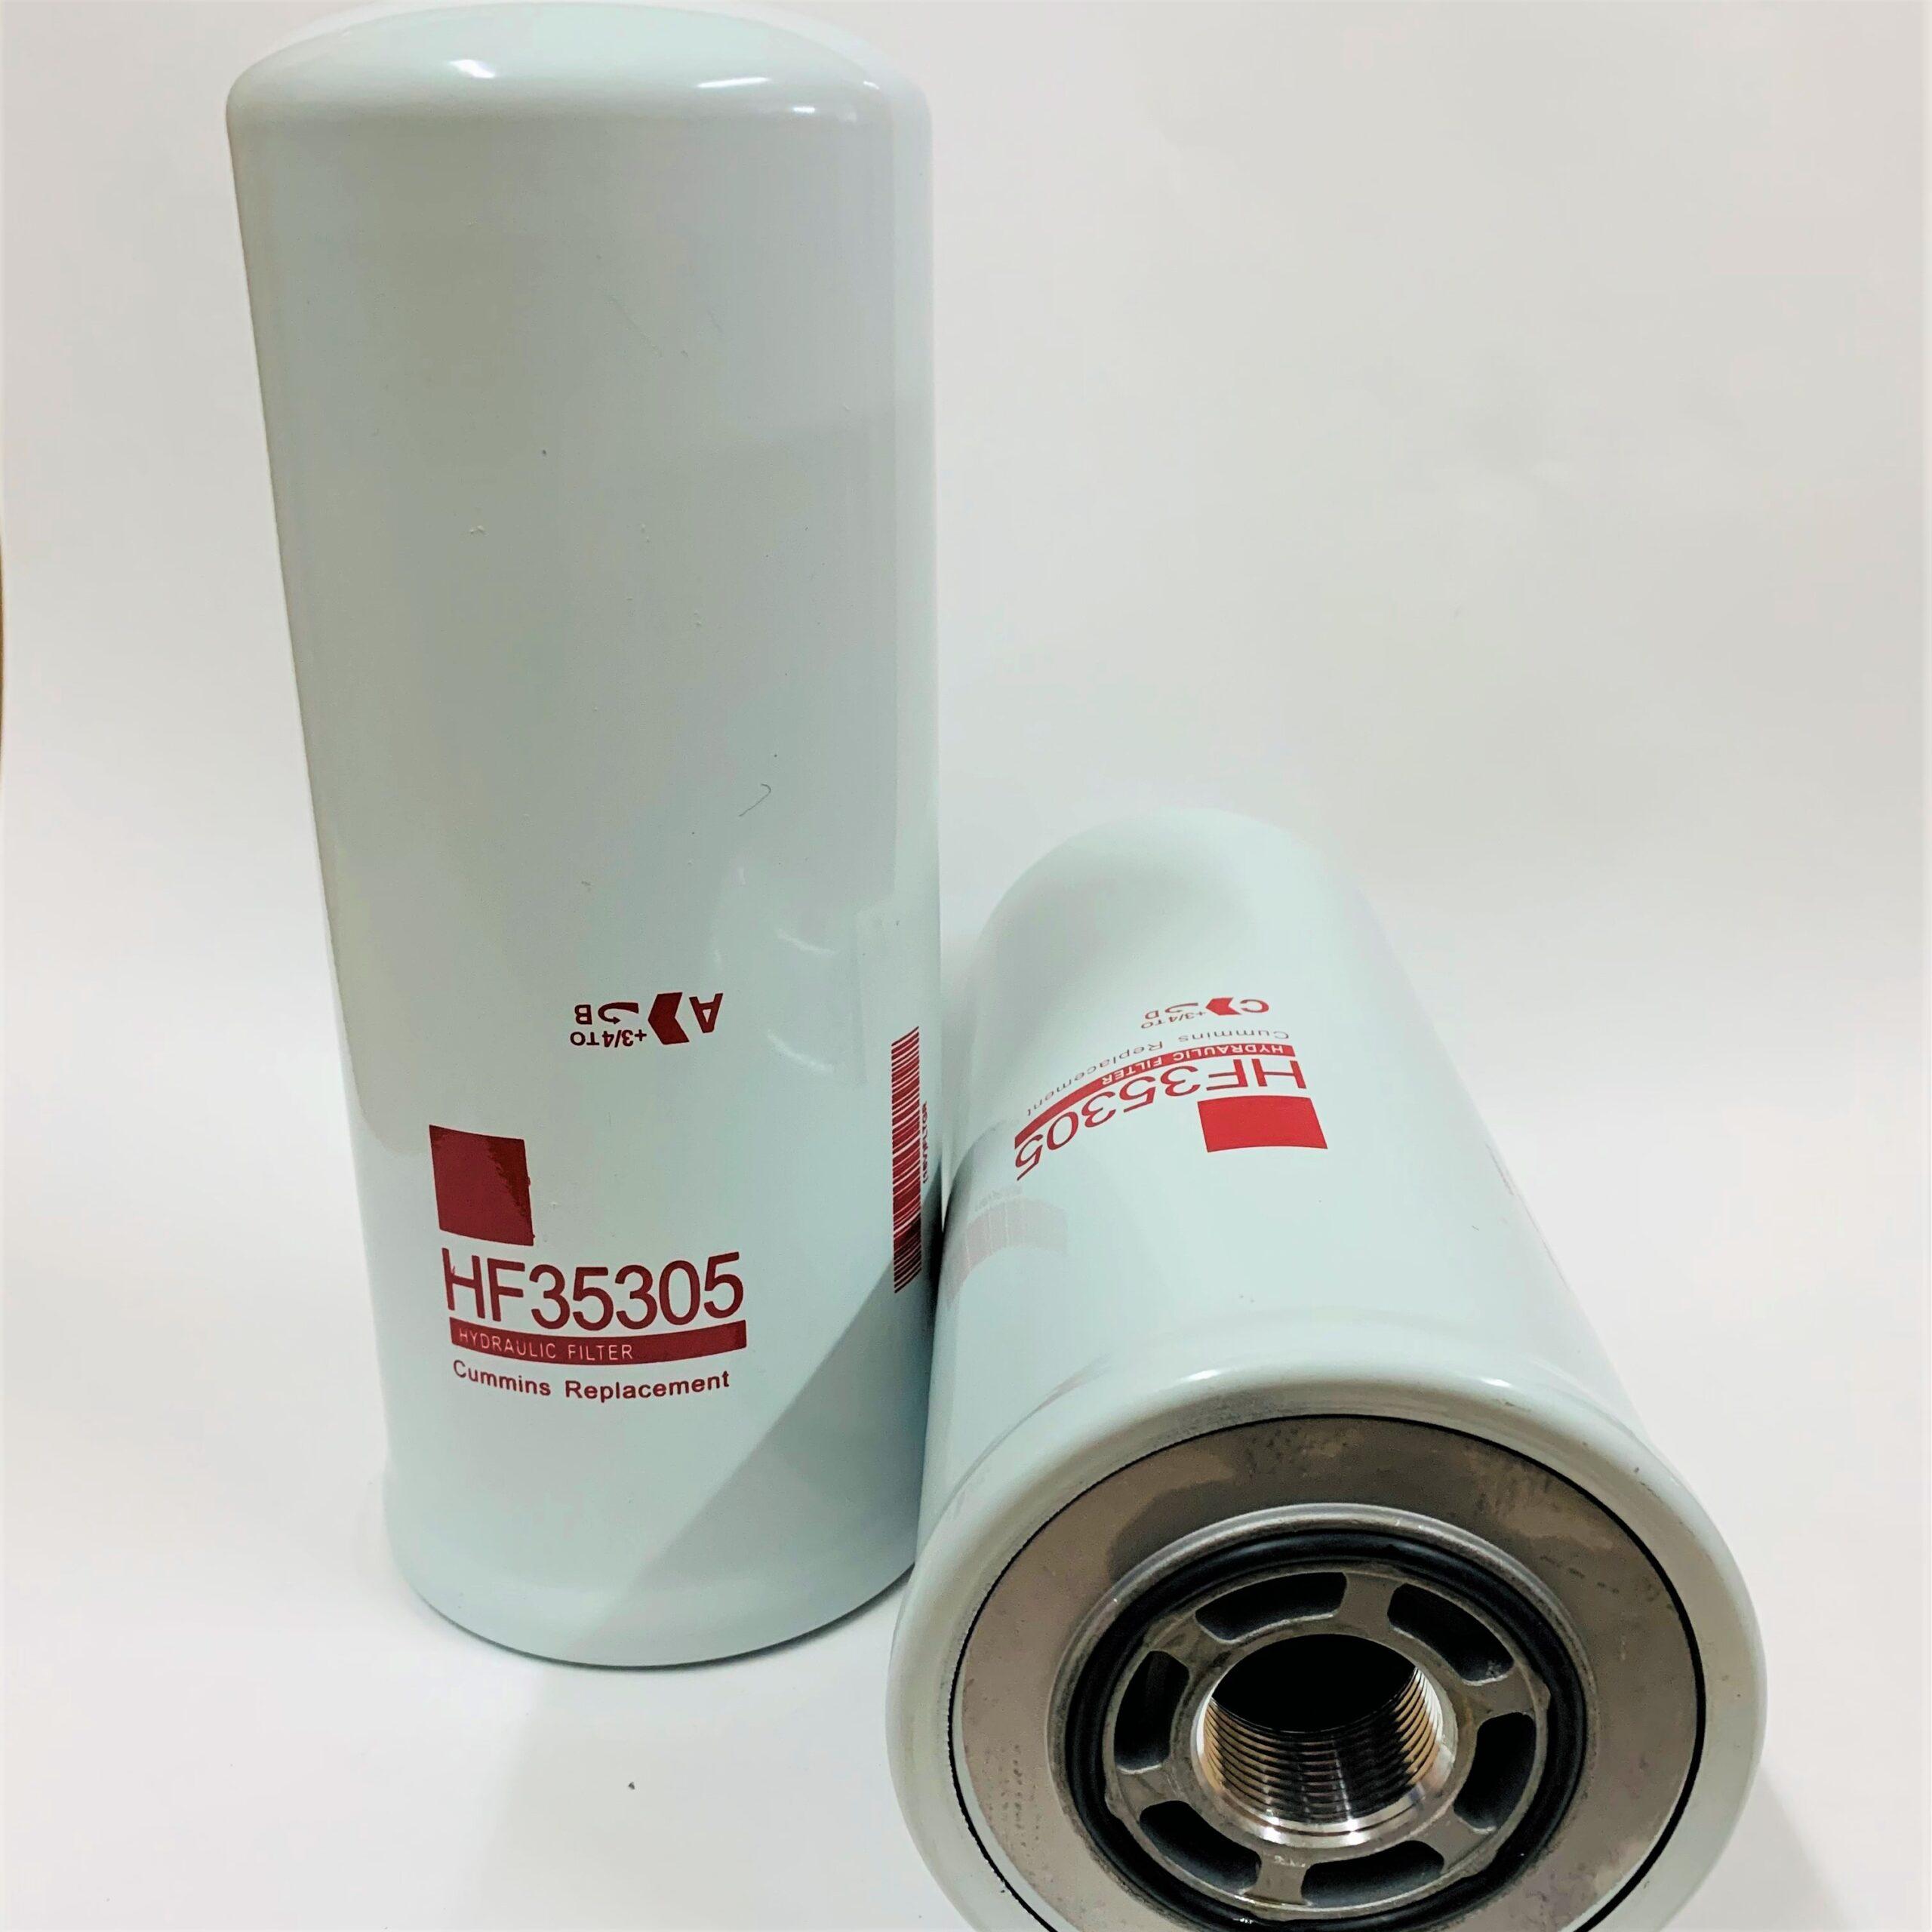 HF35305